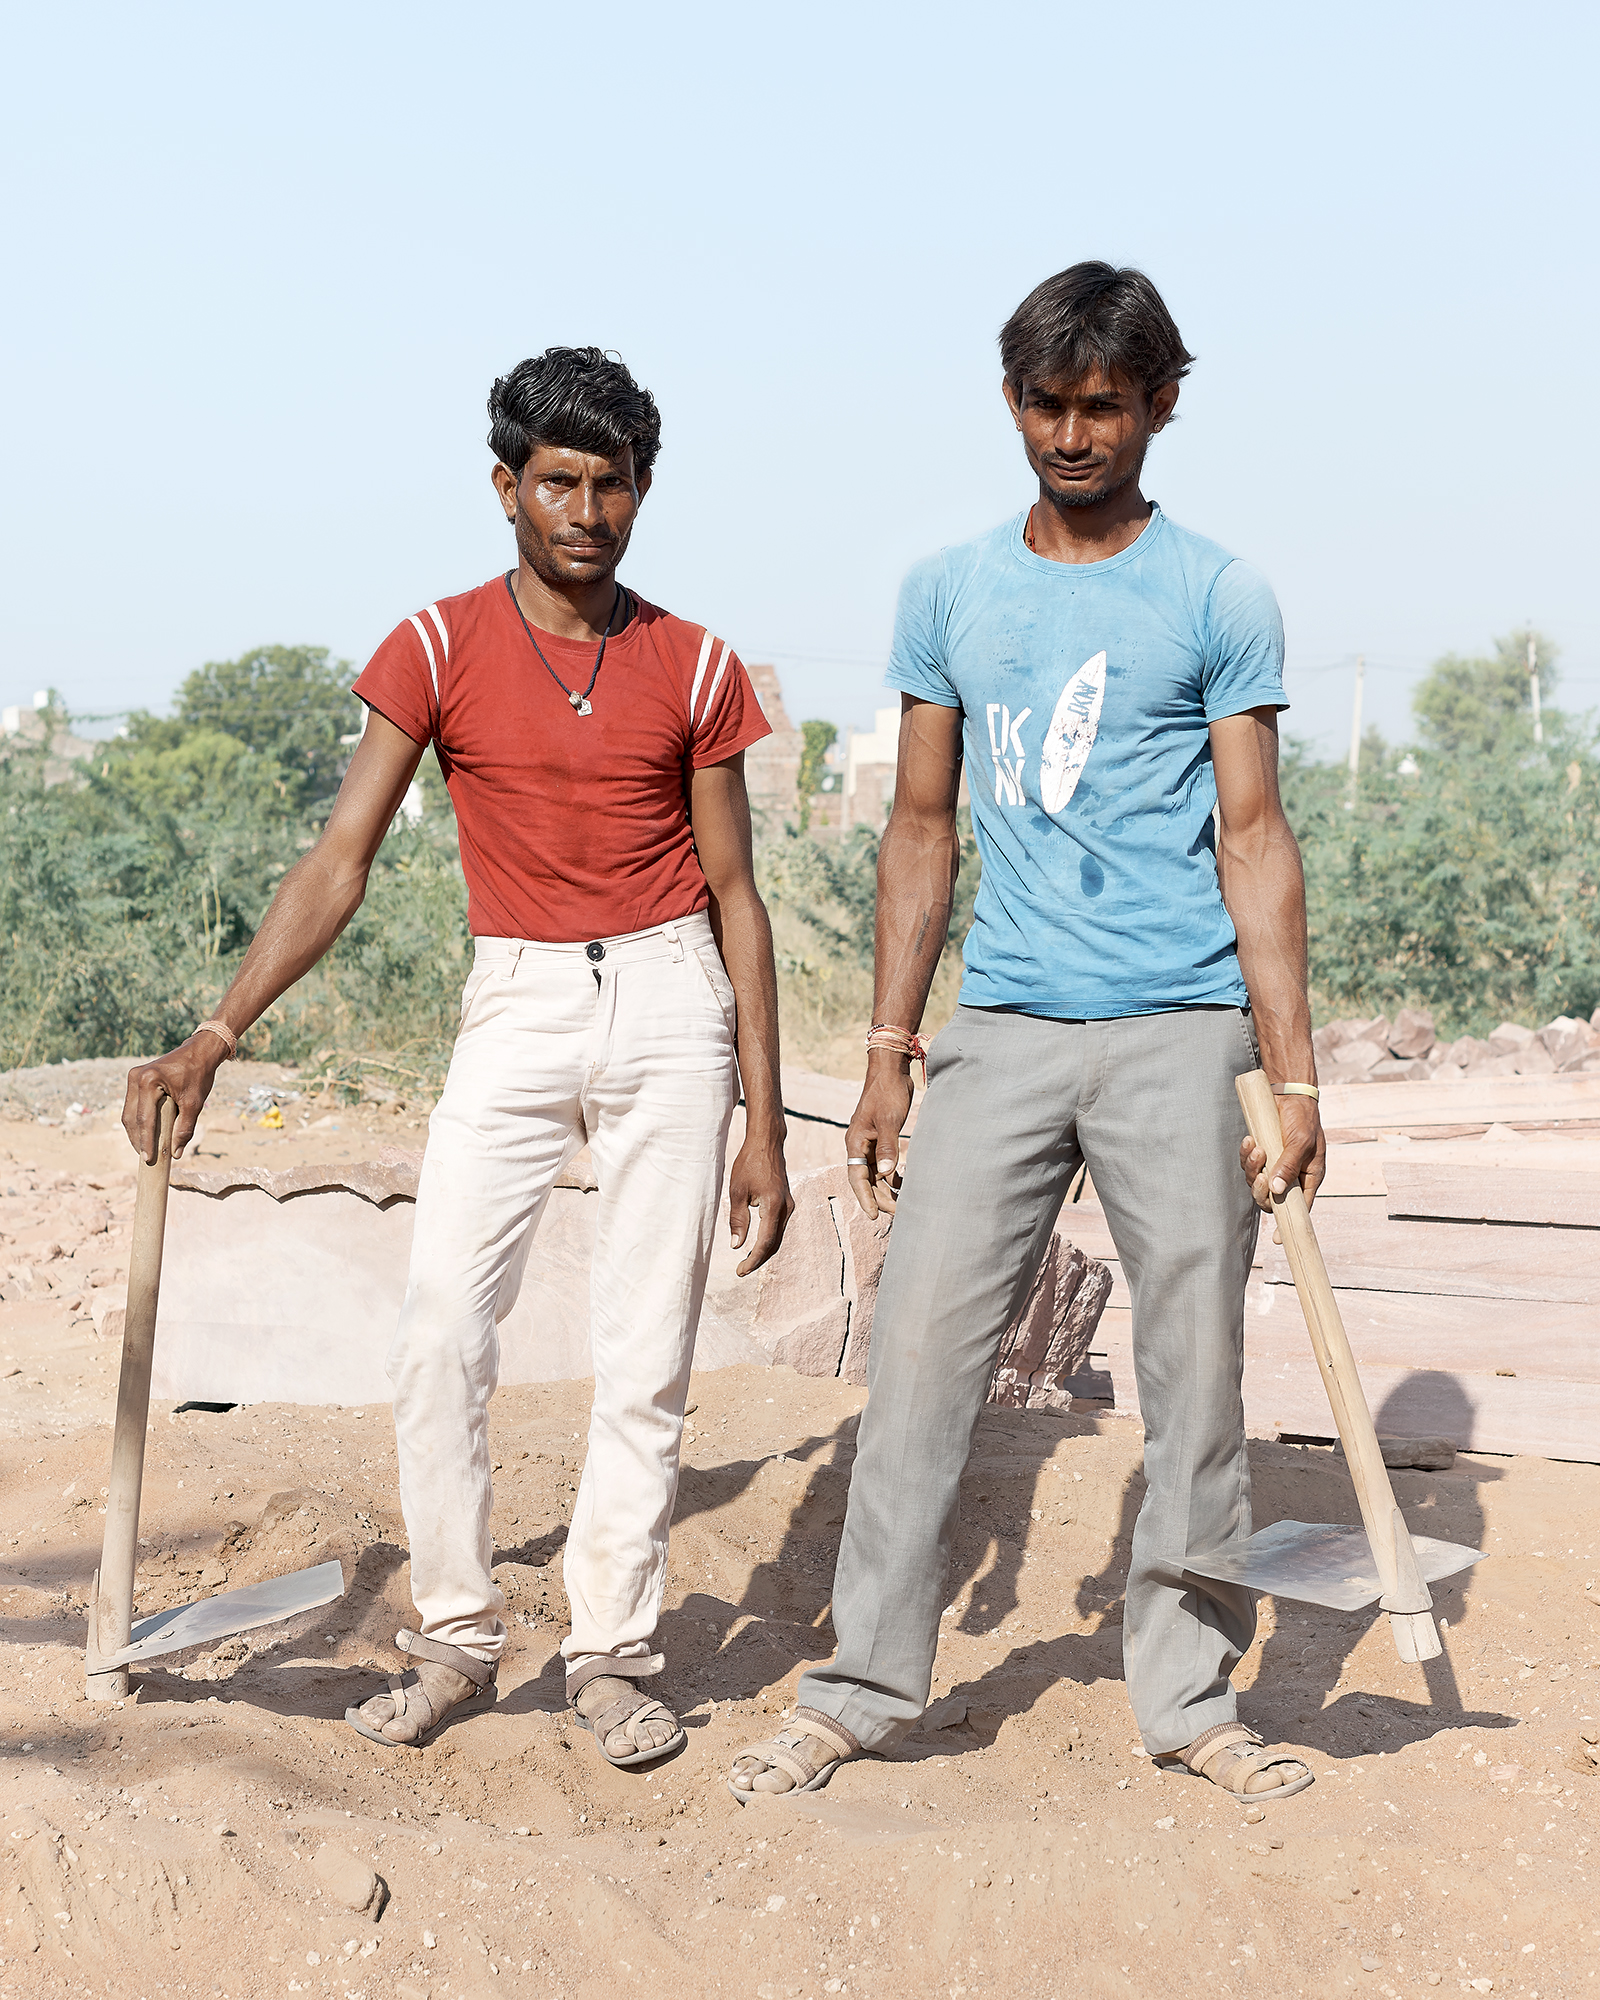 04_Builders, Osian, India, 2017.jpg